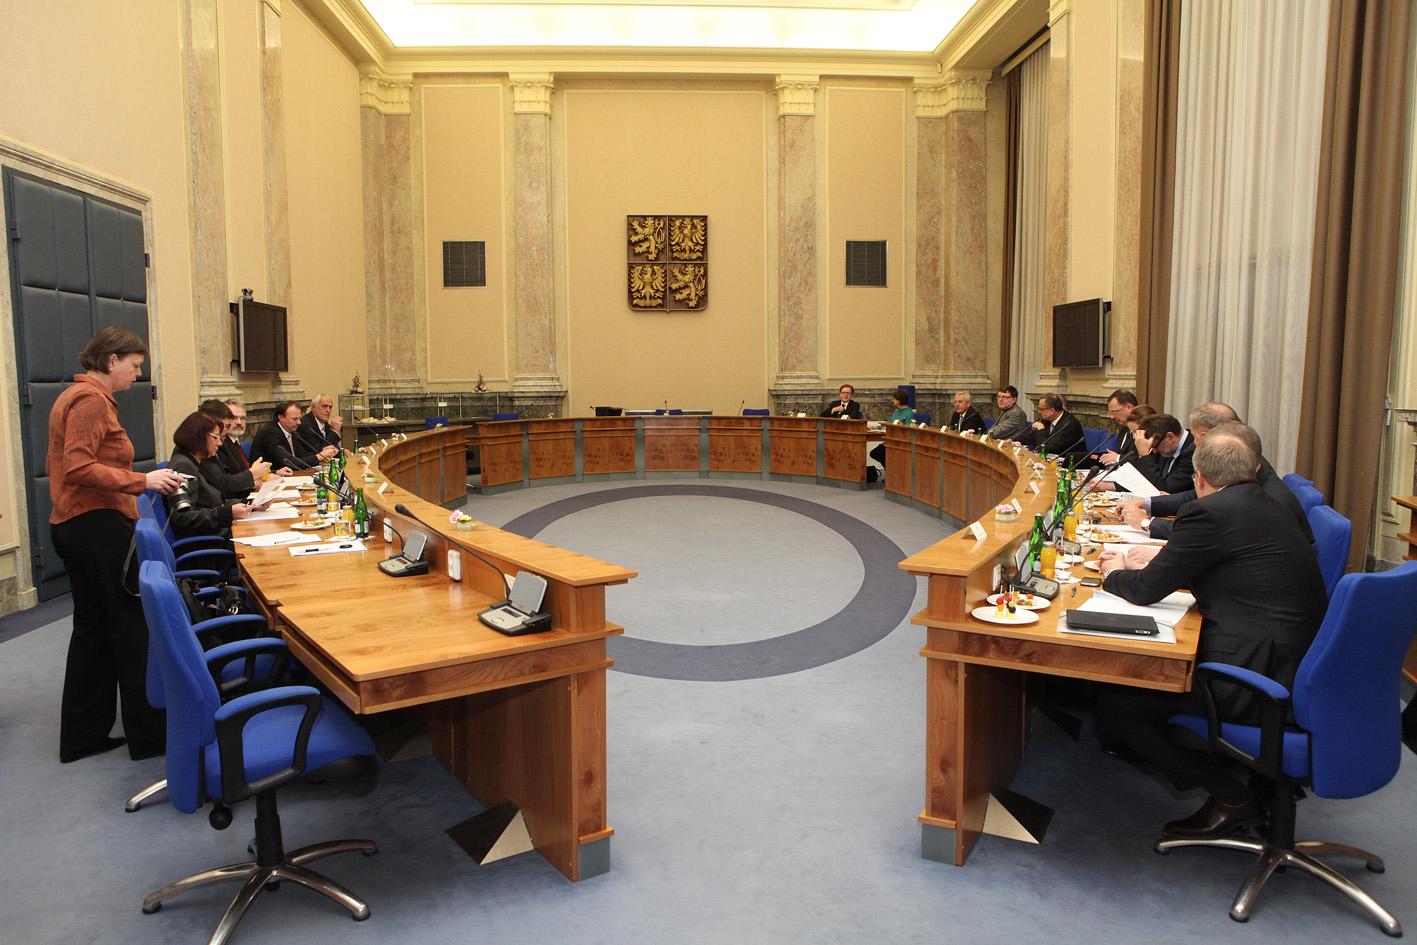 Czech_cabinet_room